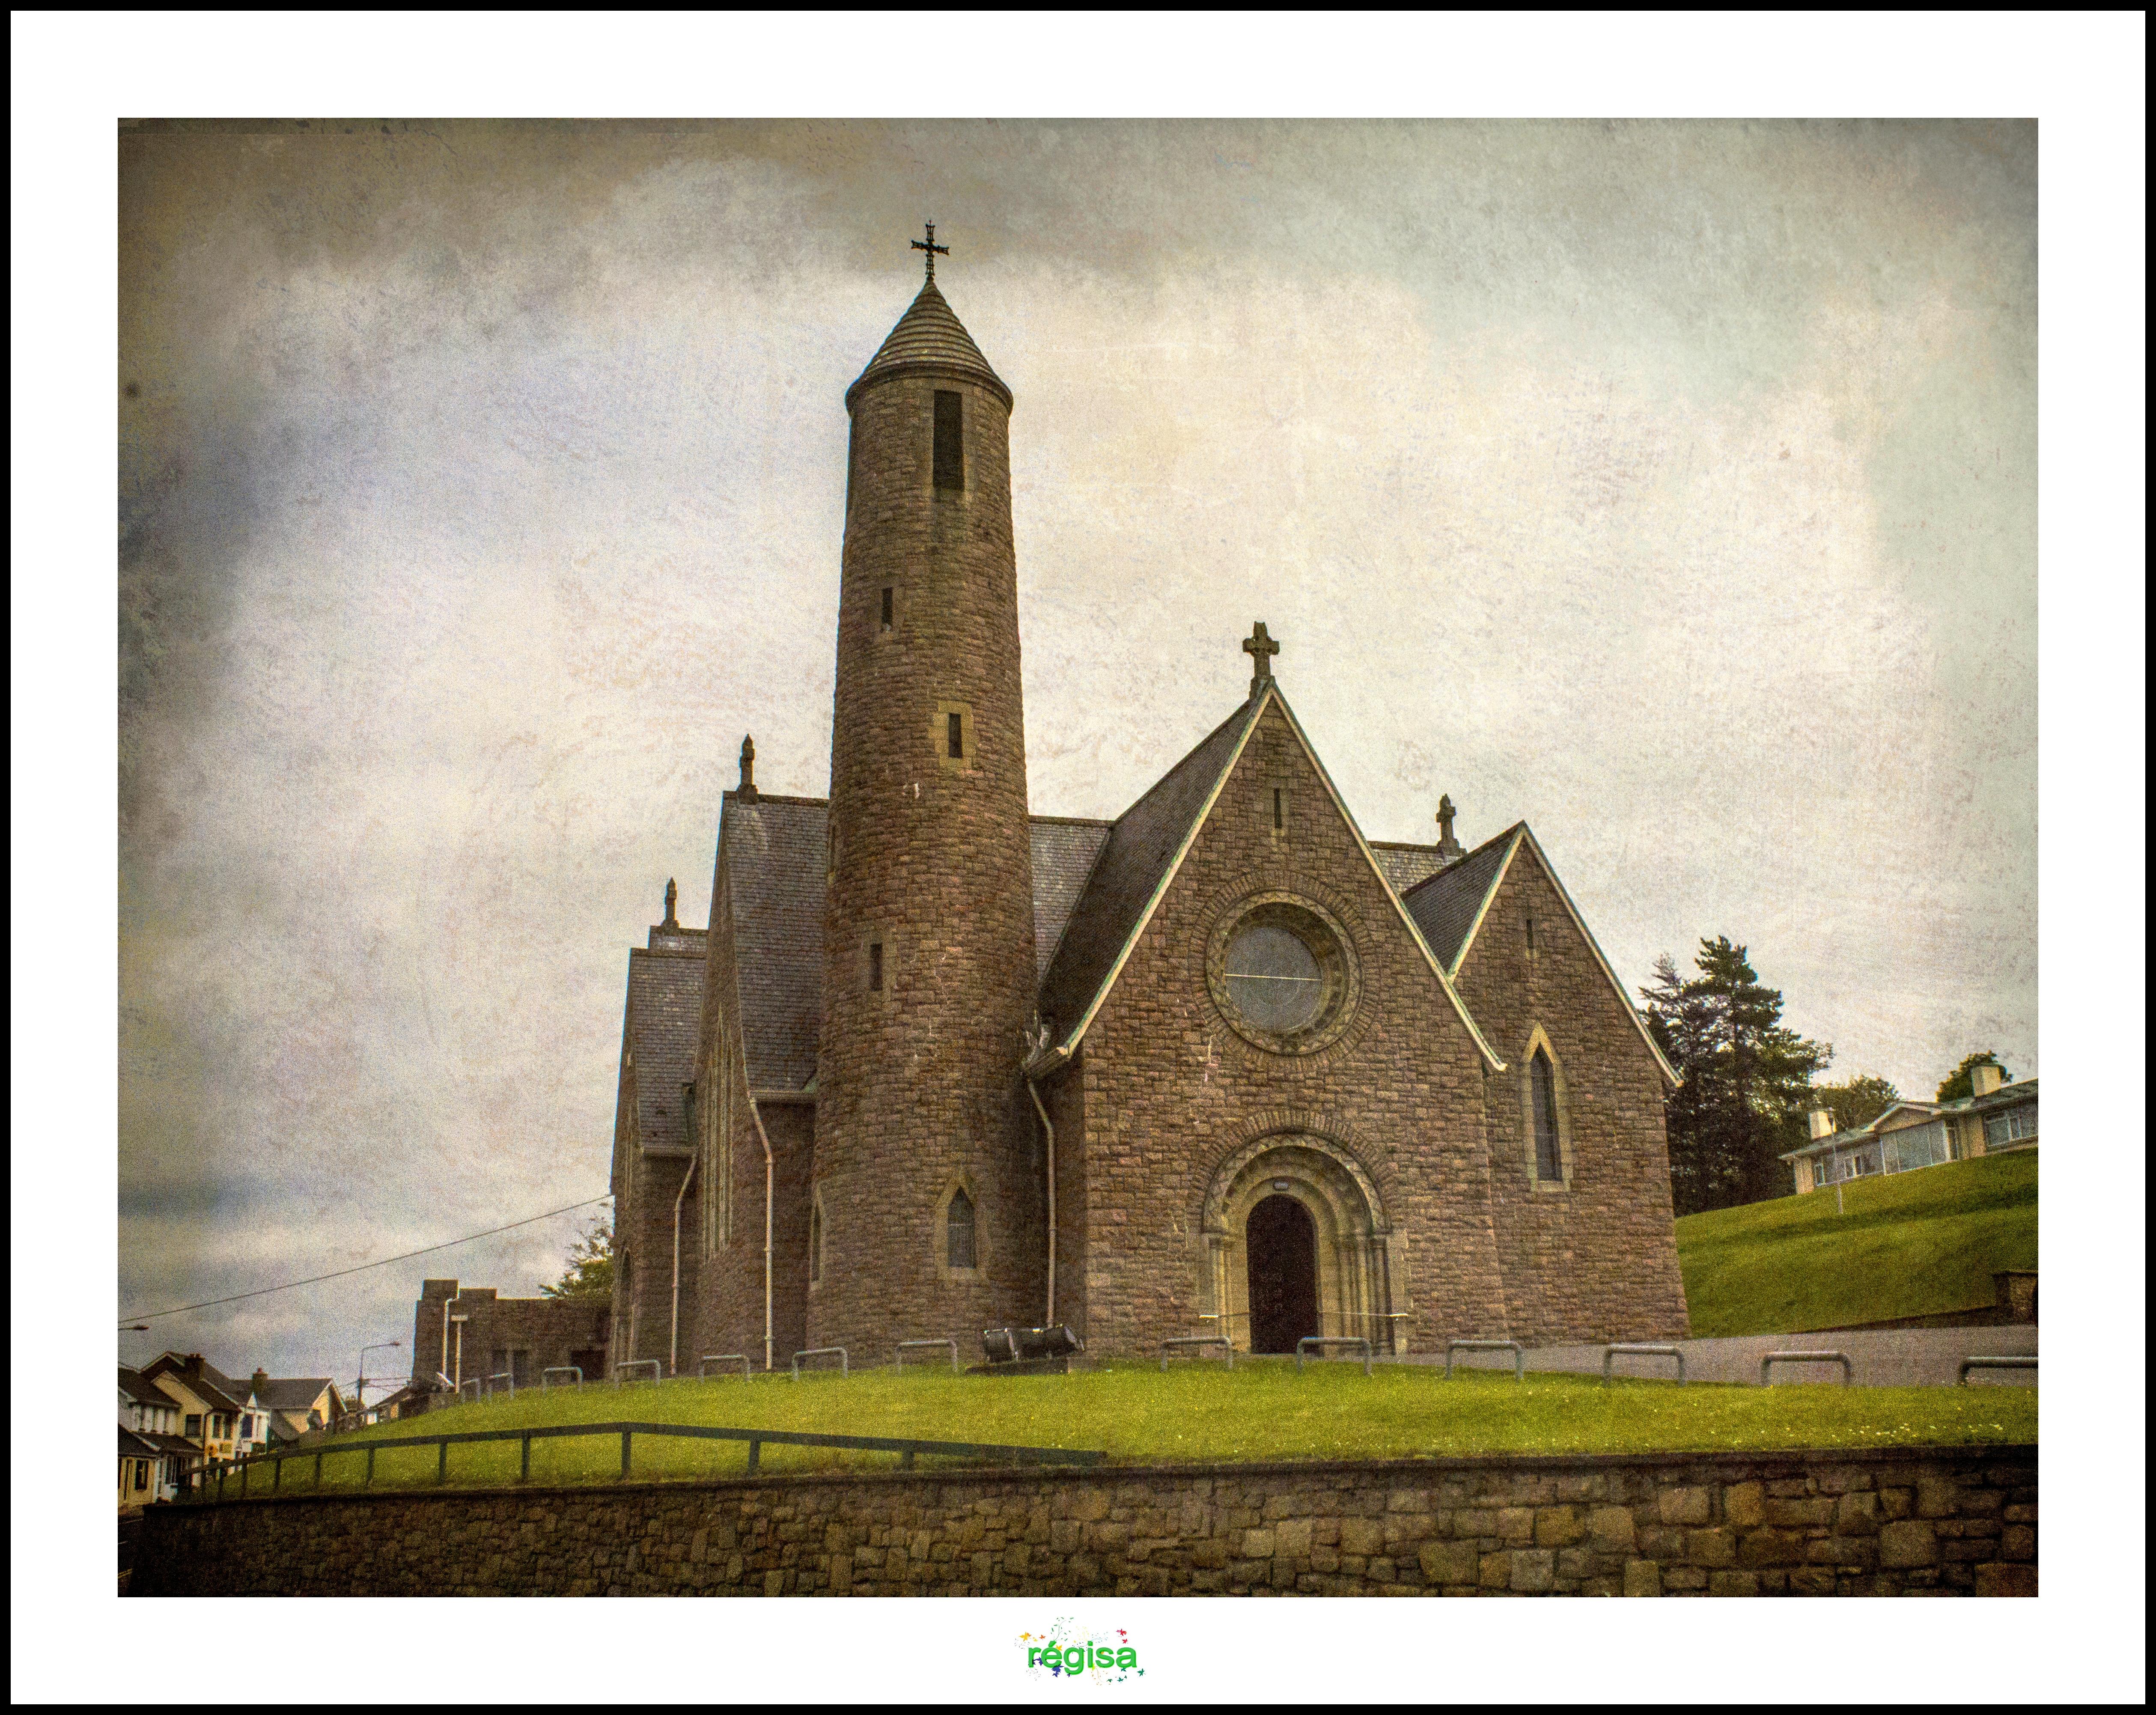 Wallpaper : city, building, sky, history, town, Ireland, church ...